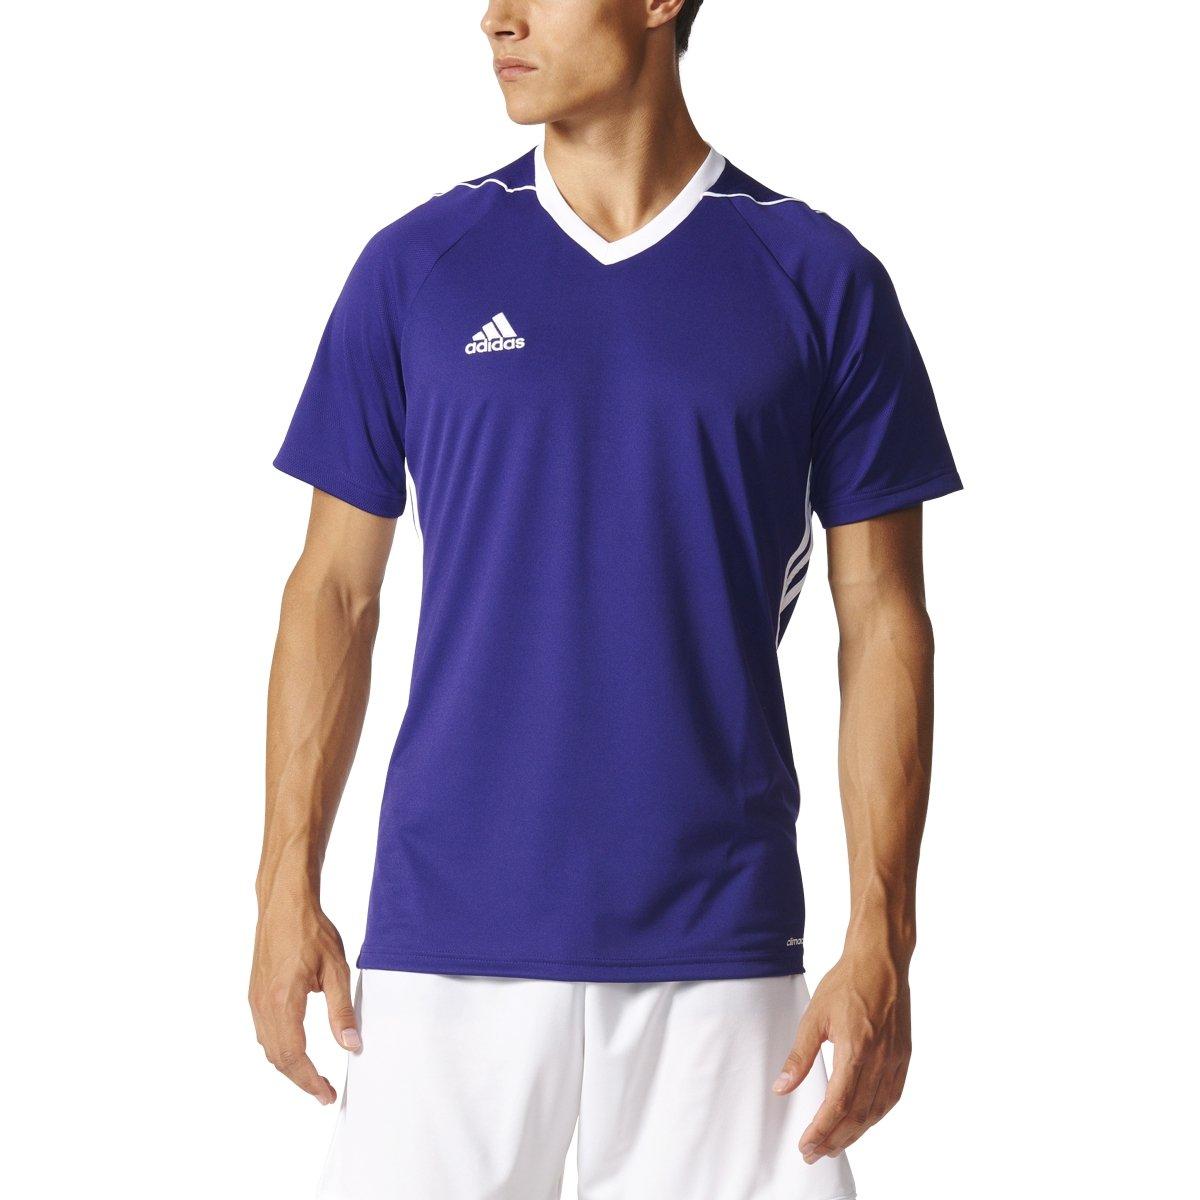 Adidas Tiro 17 Mens Soccer Jersey XS Collegiate Purple/White by adidas